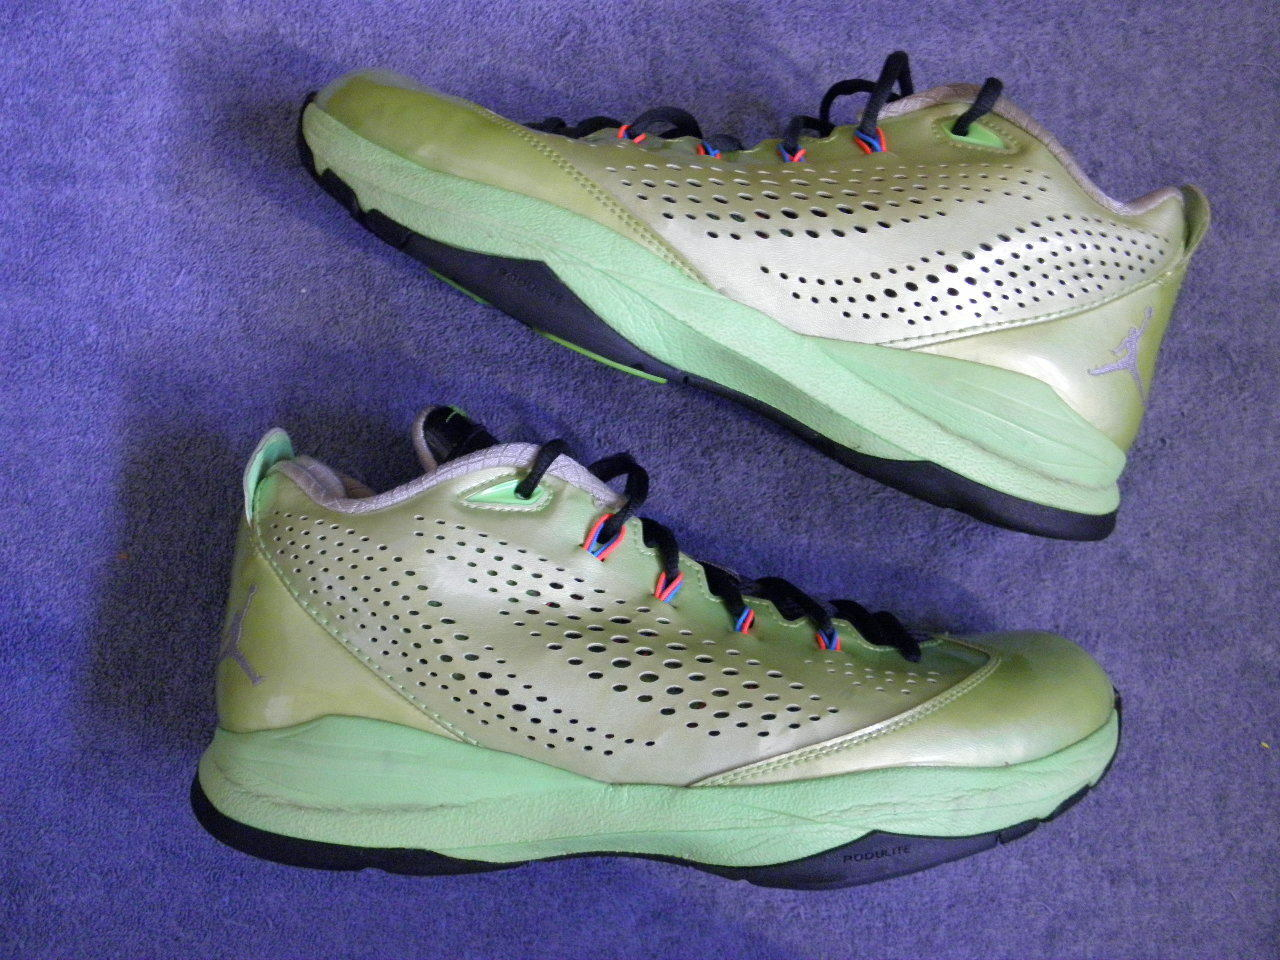 Nike air jordan cp3 vii chris paul 7 electric verde taglia 11 euc vi 6 6 '